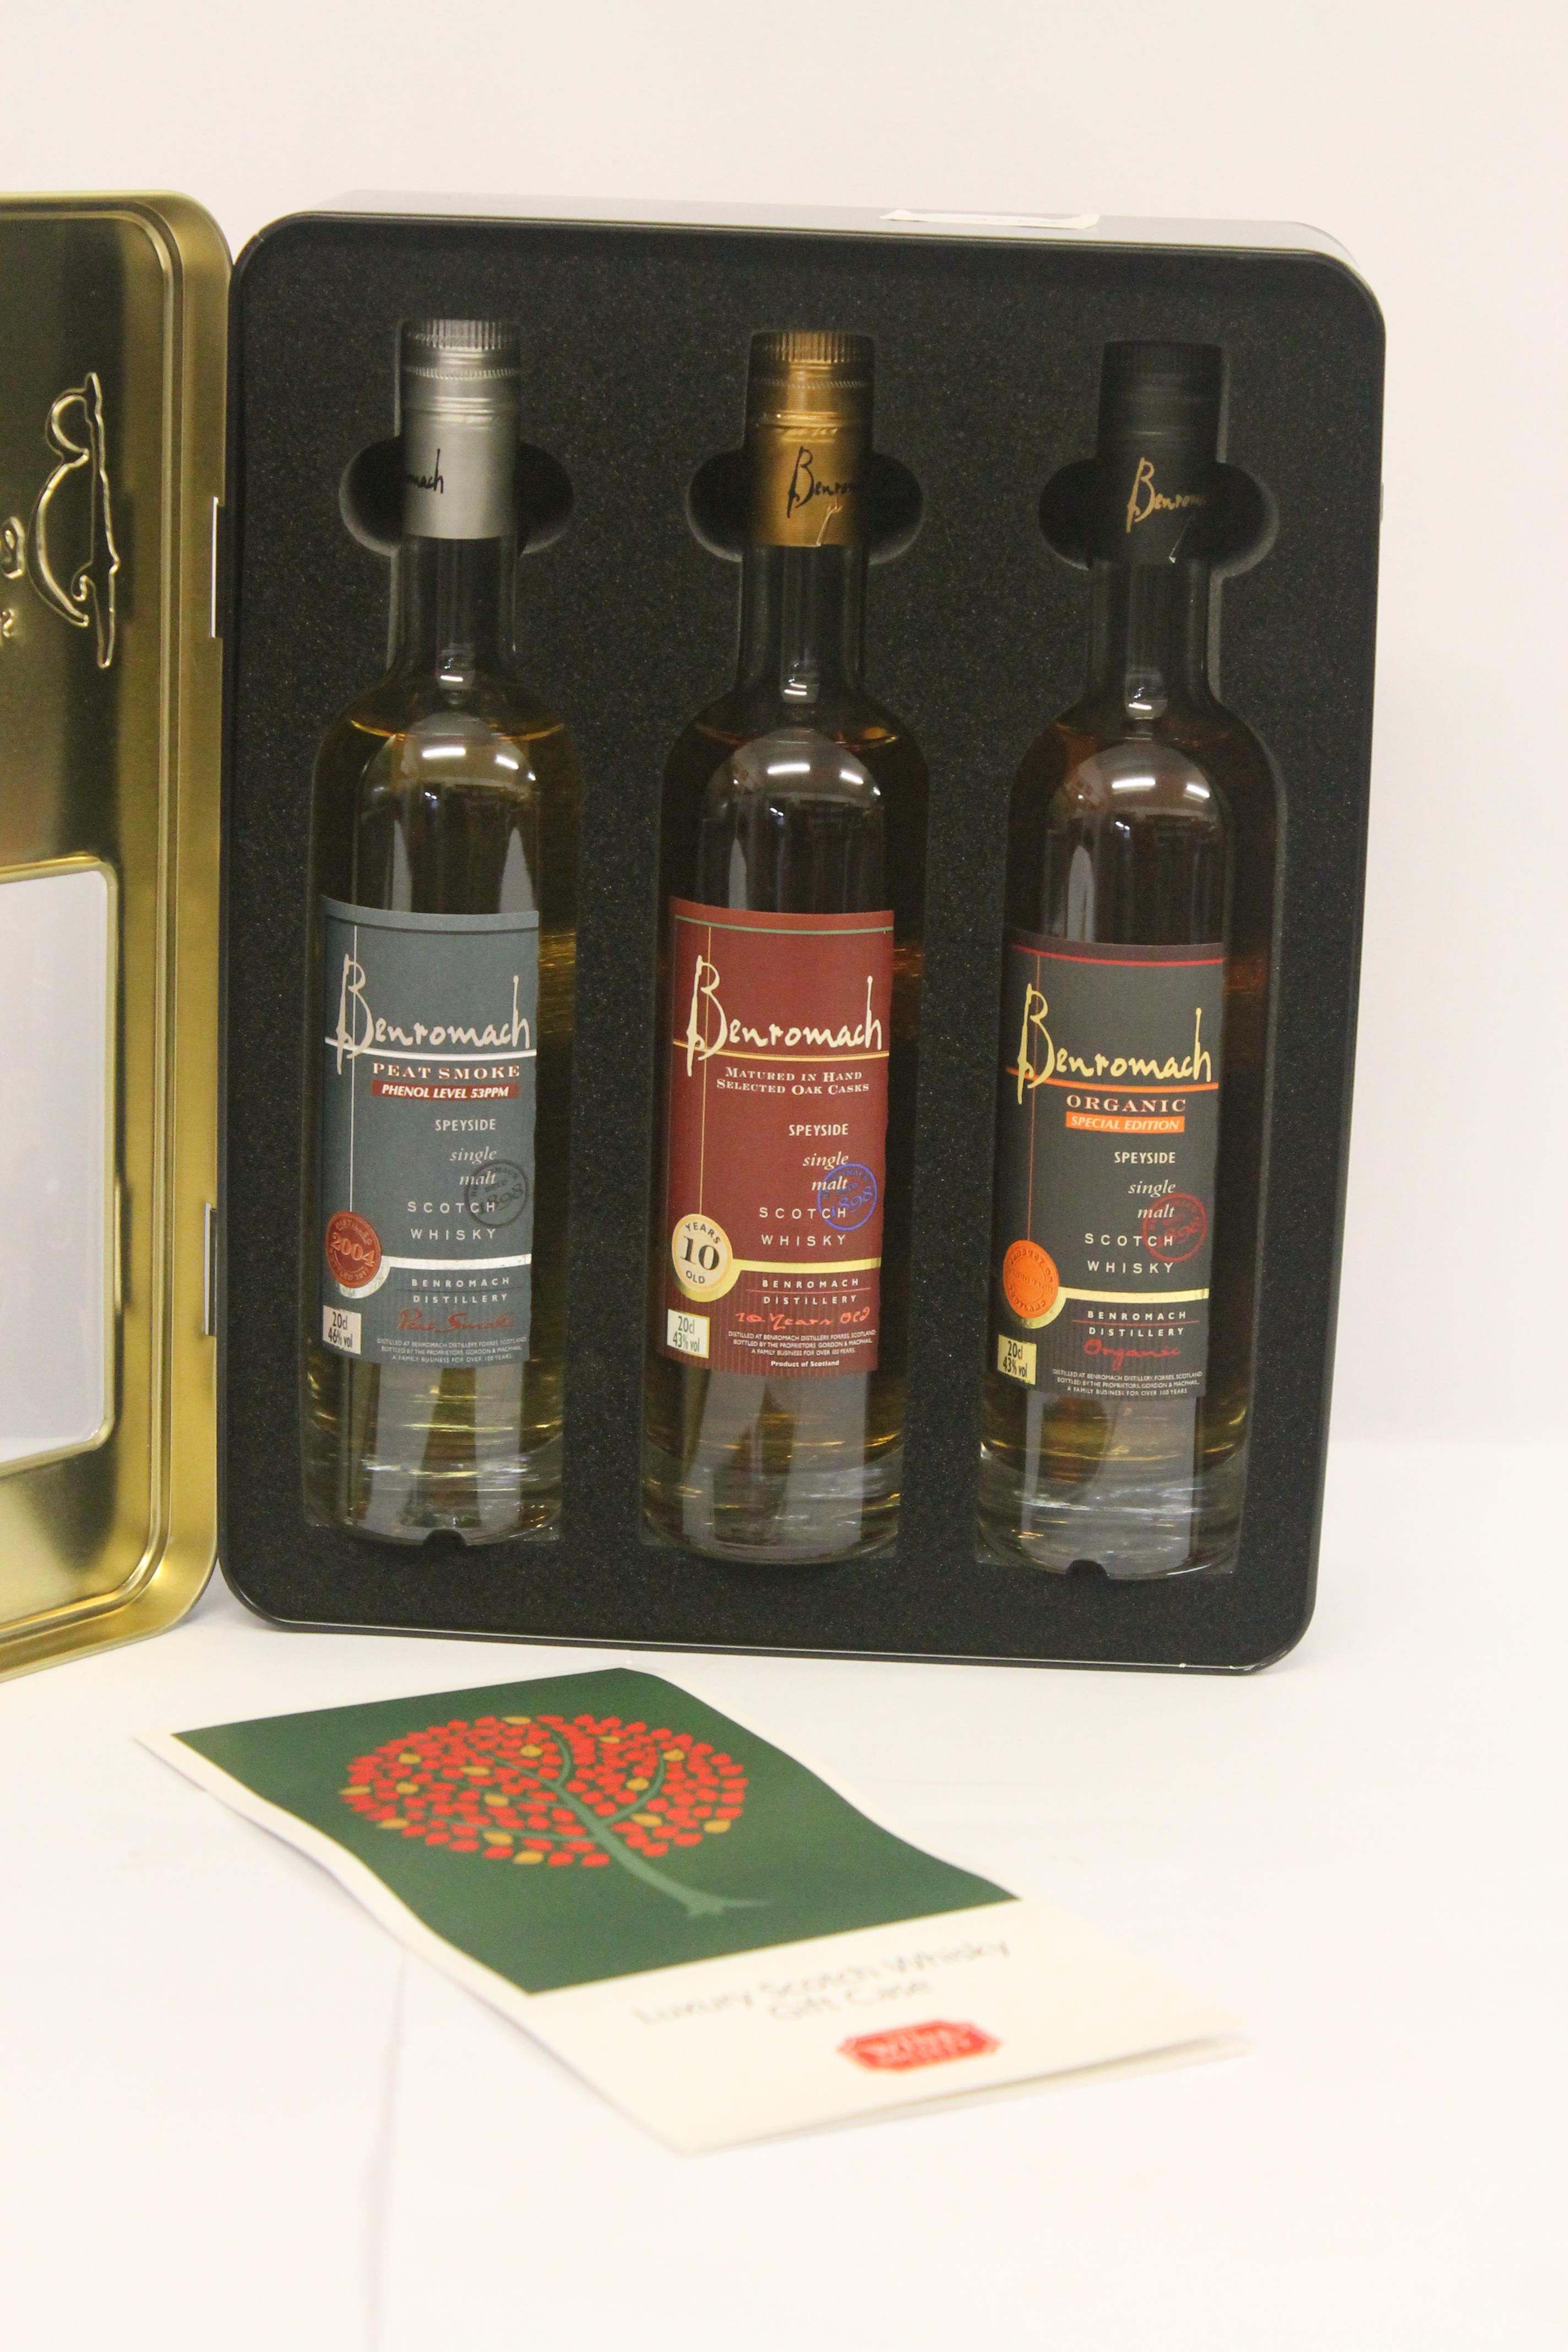 Lot 7385 - Benromach Speyside single malt Scotch whisky gift case containing 3 x 20cl bottles.